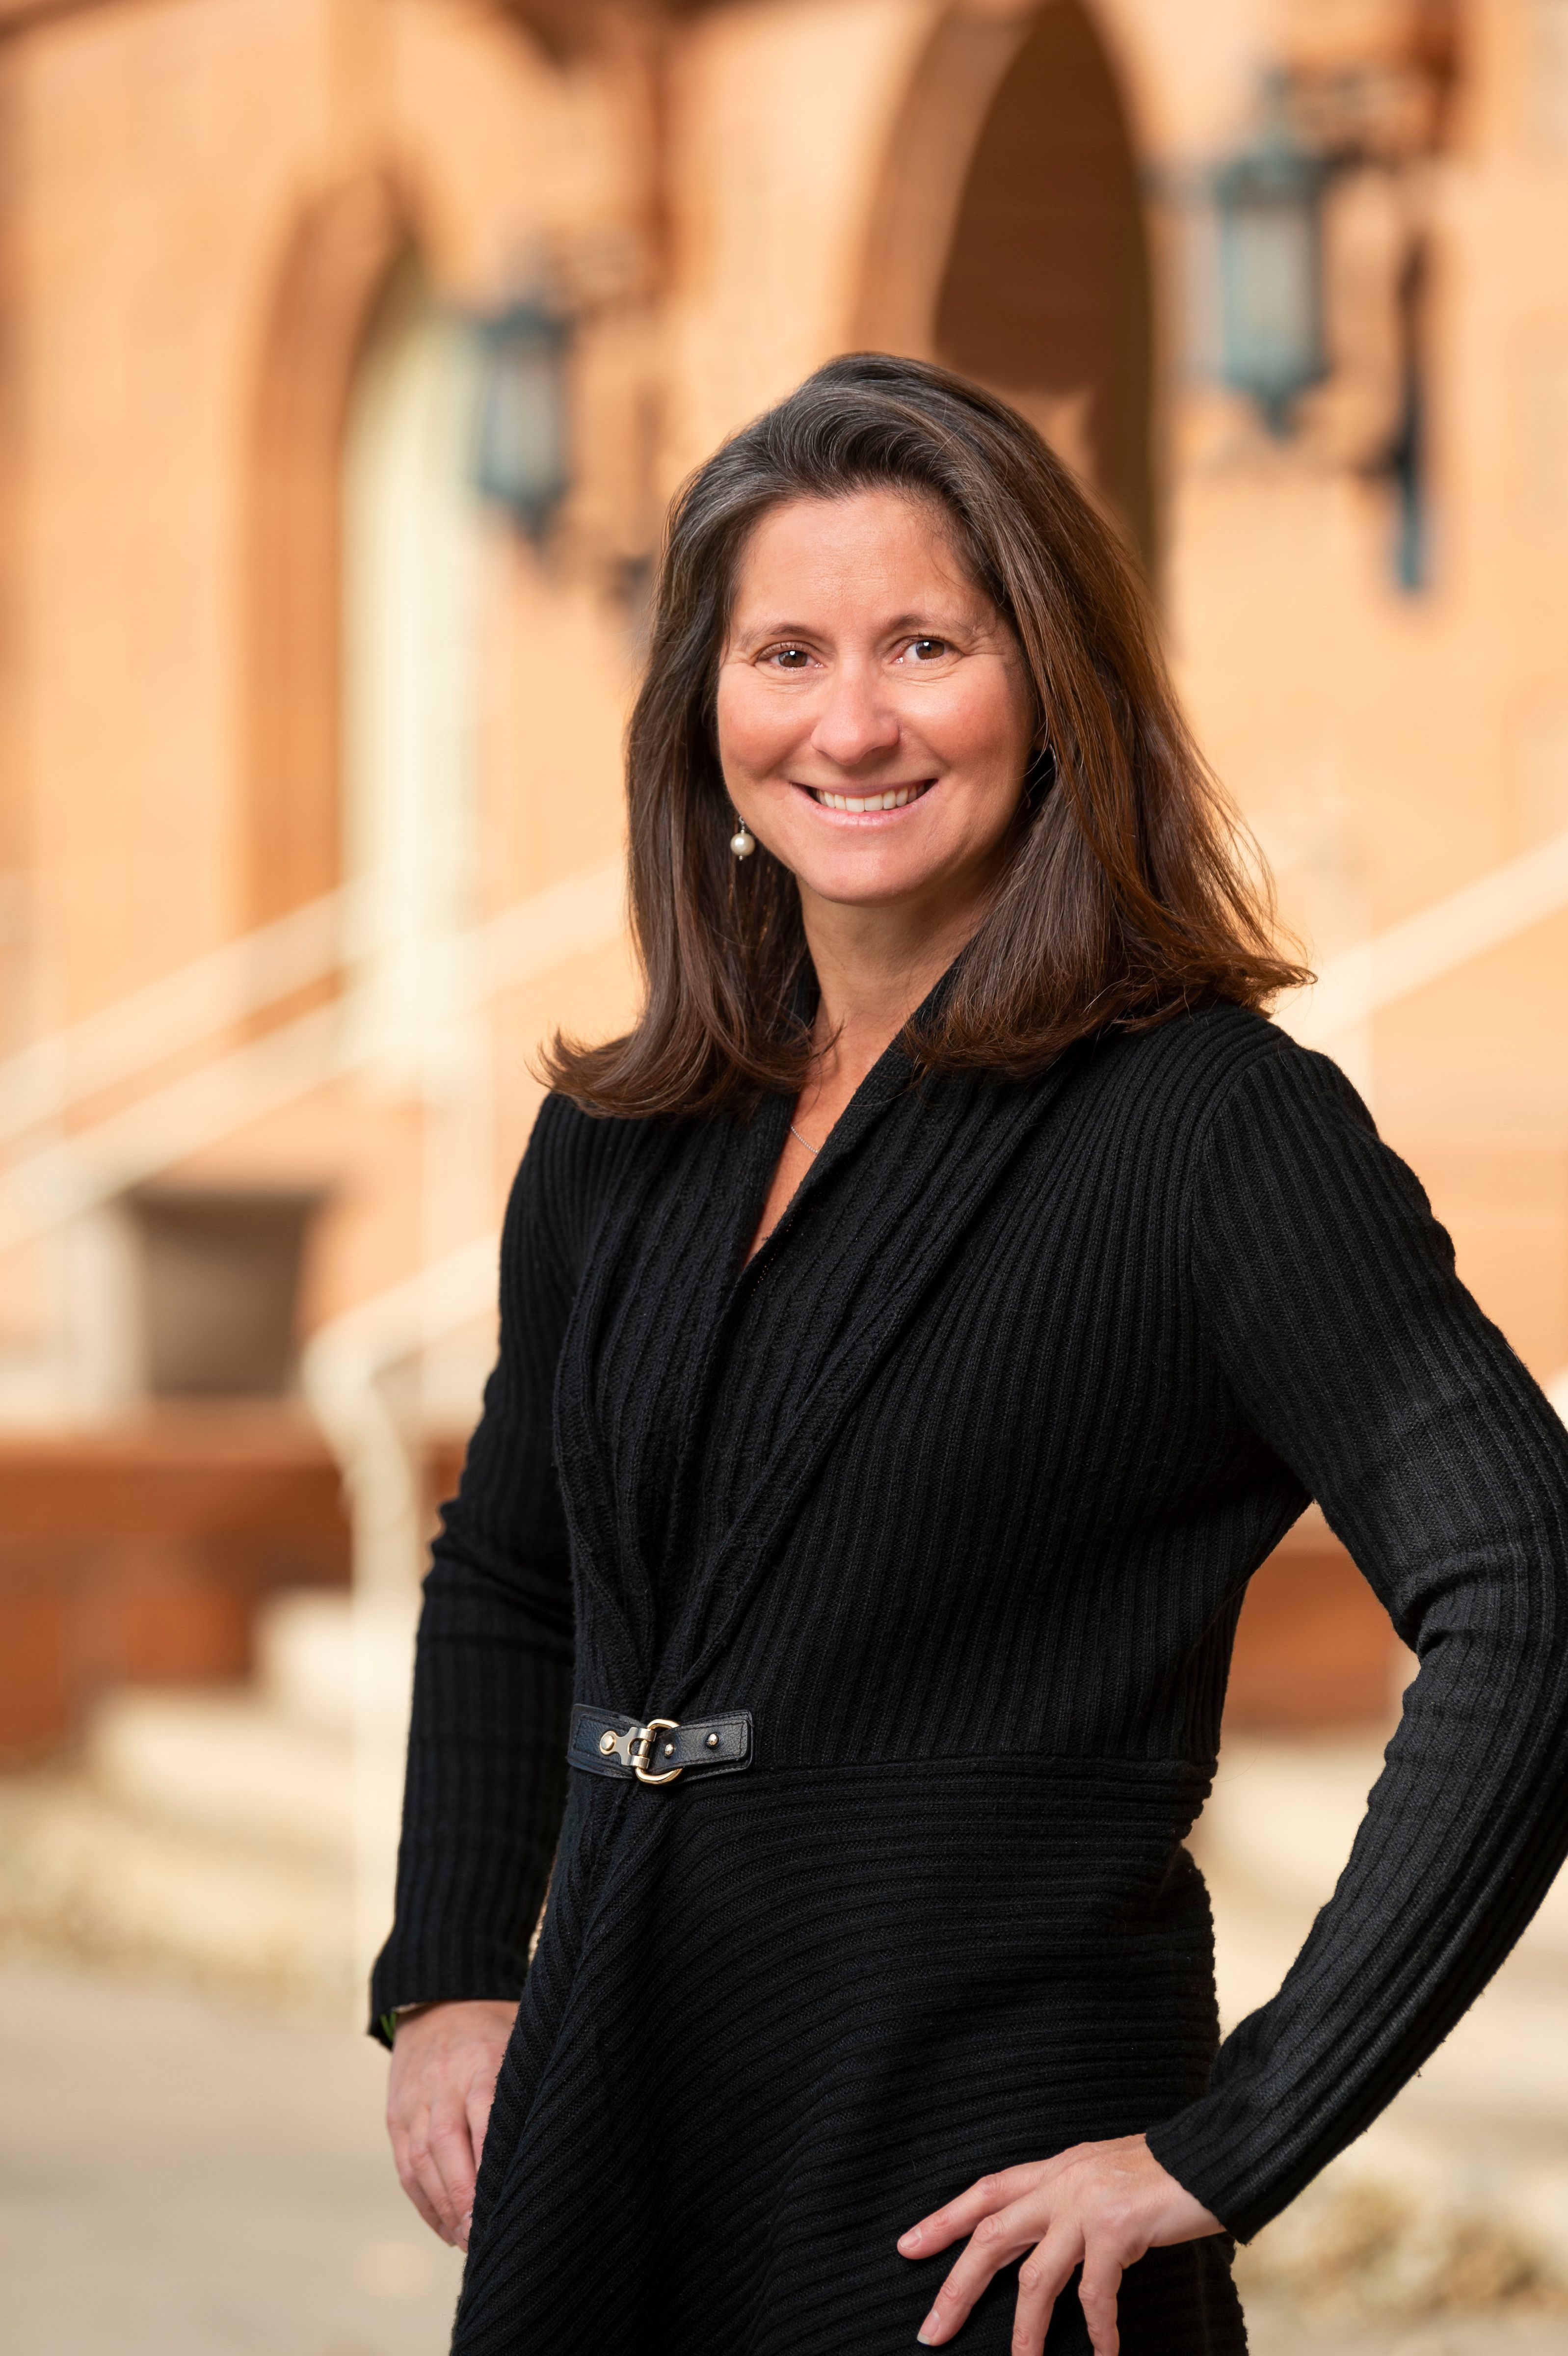 Sarah Berkman, Vice President, Development